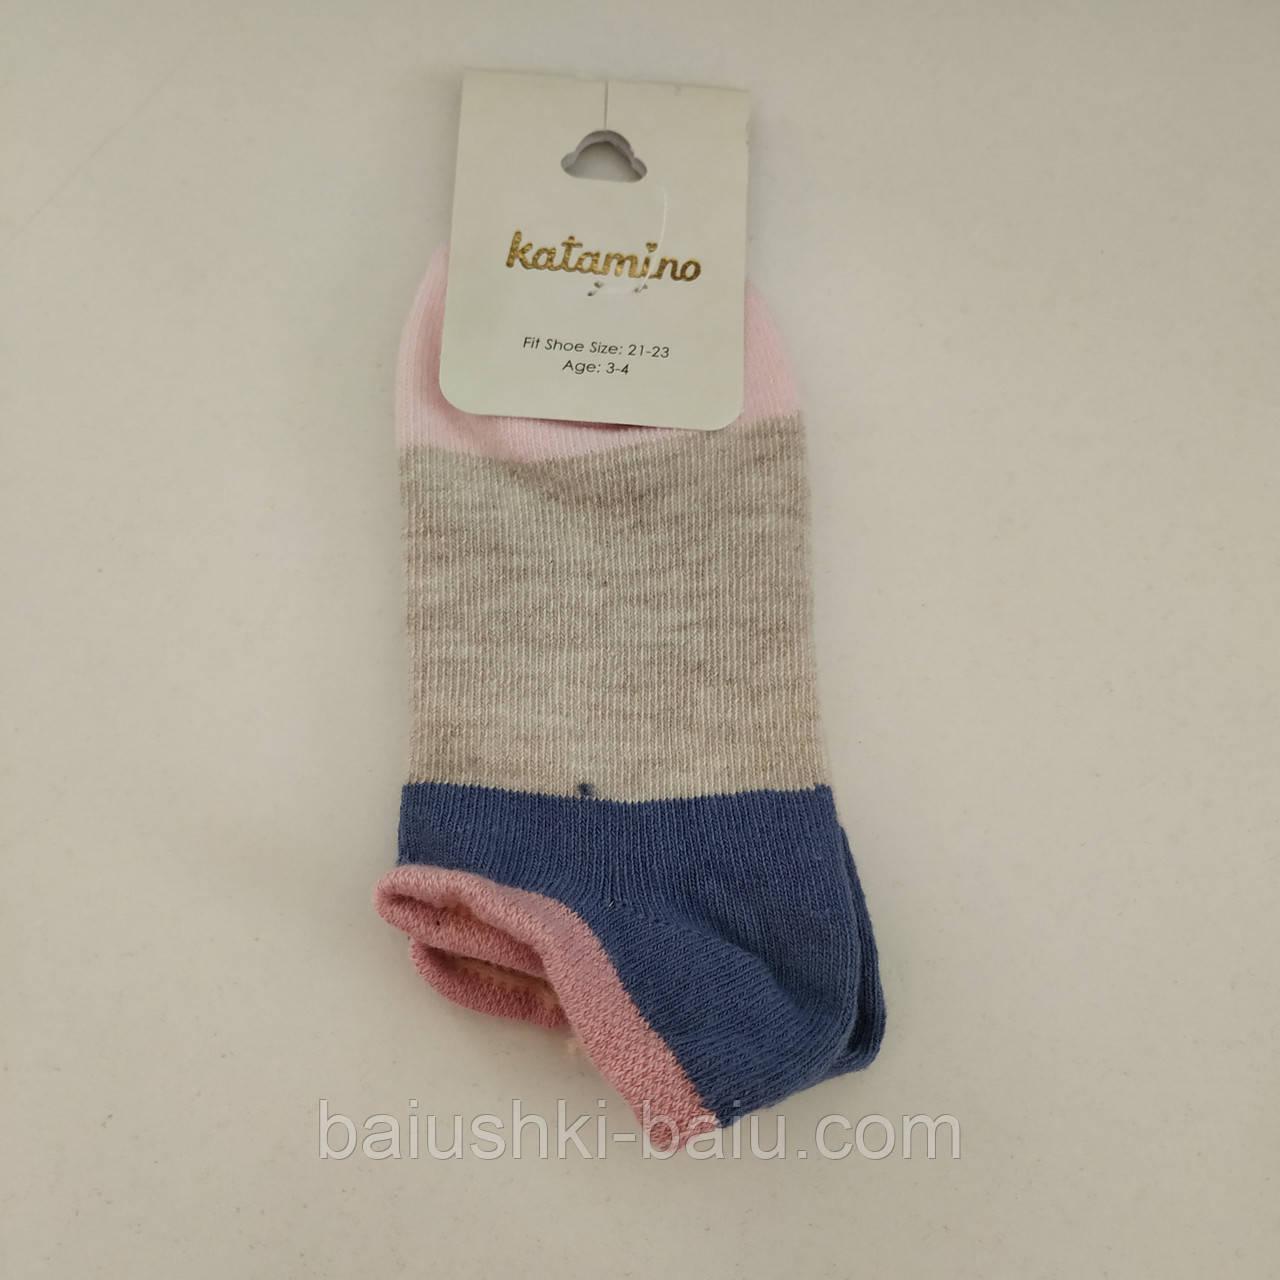 Детские короткие носки для девочки, р. 3-4 года